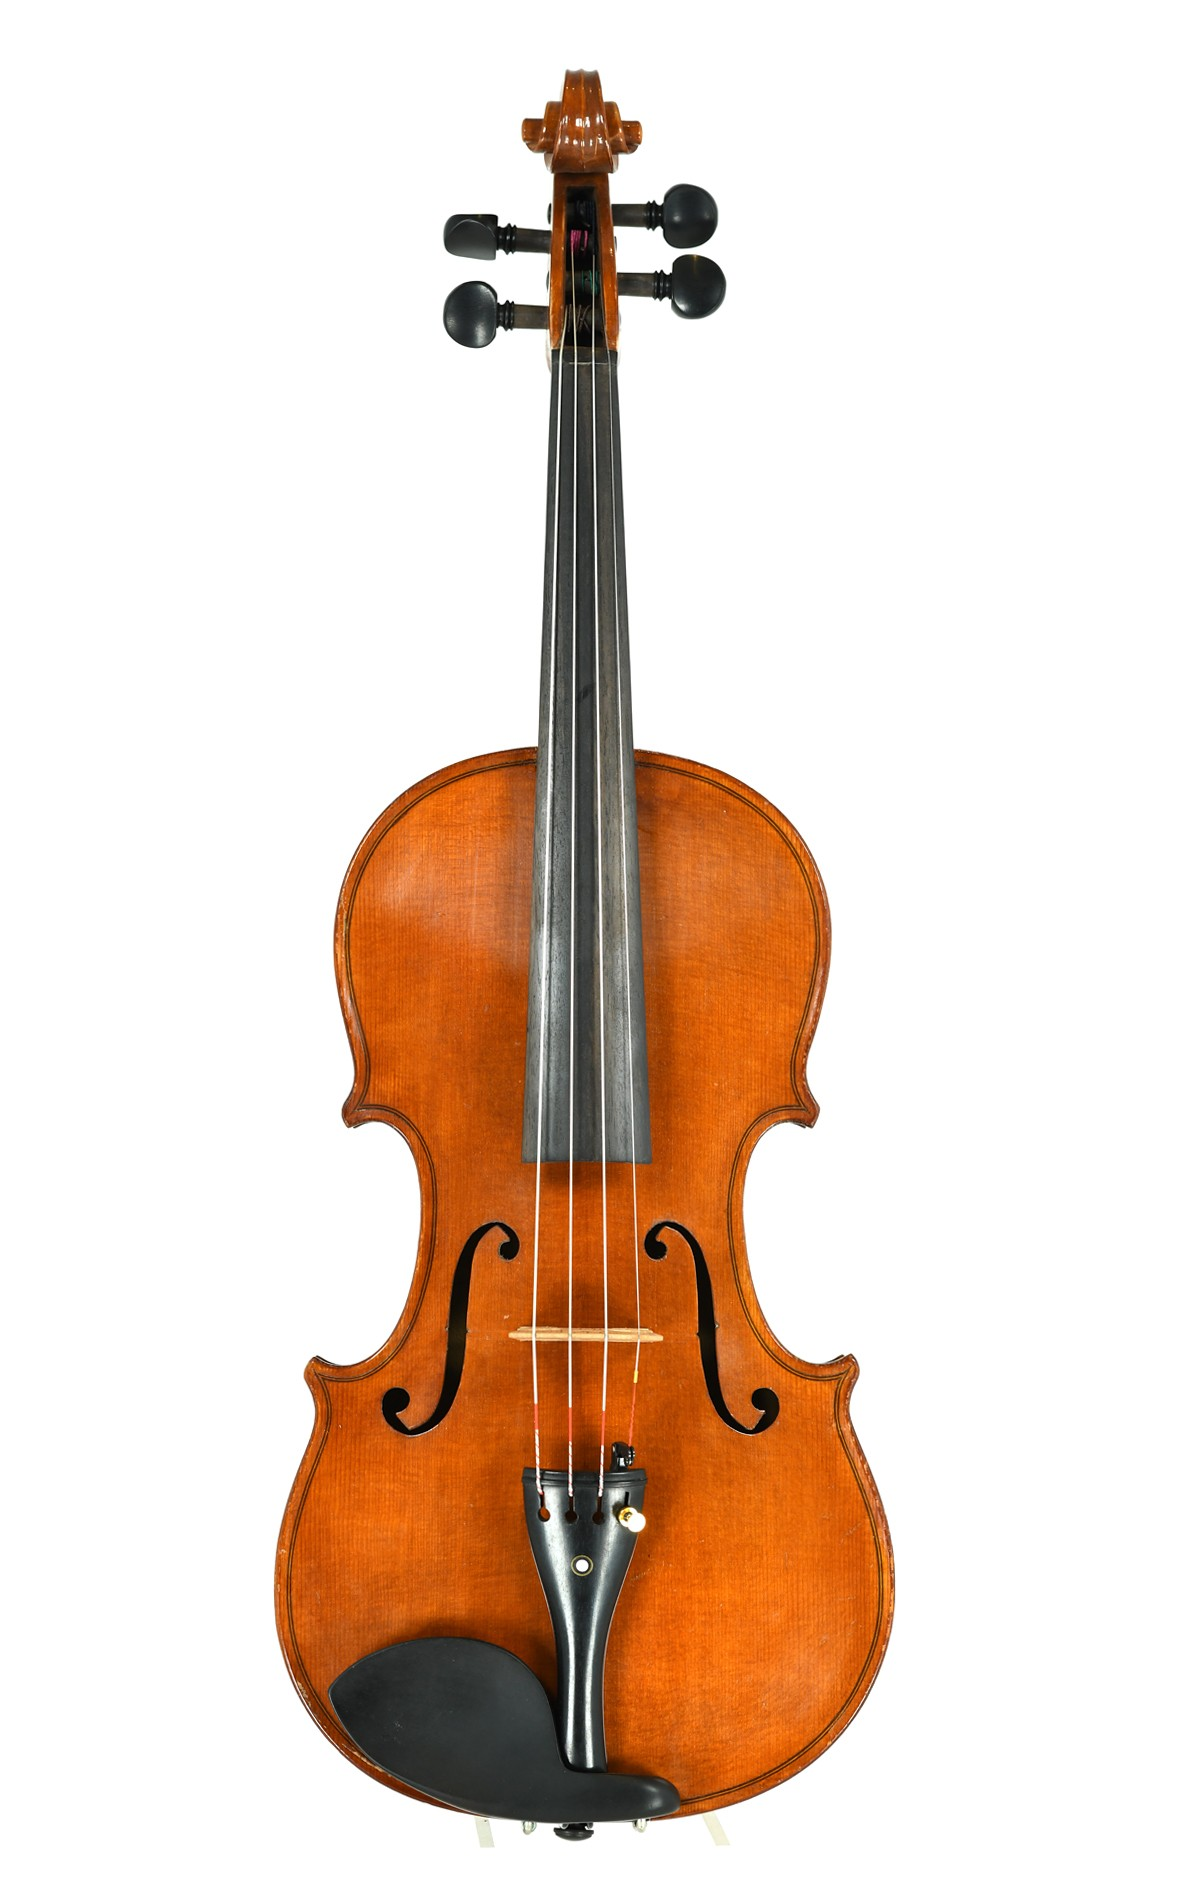 Excellent sounding modern Markneukirchen violin - top